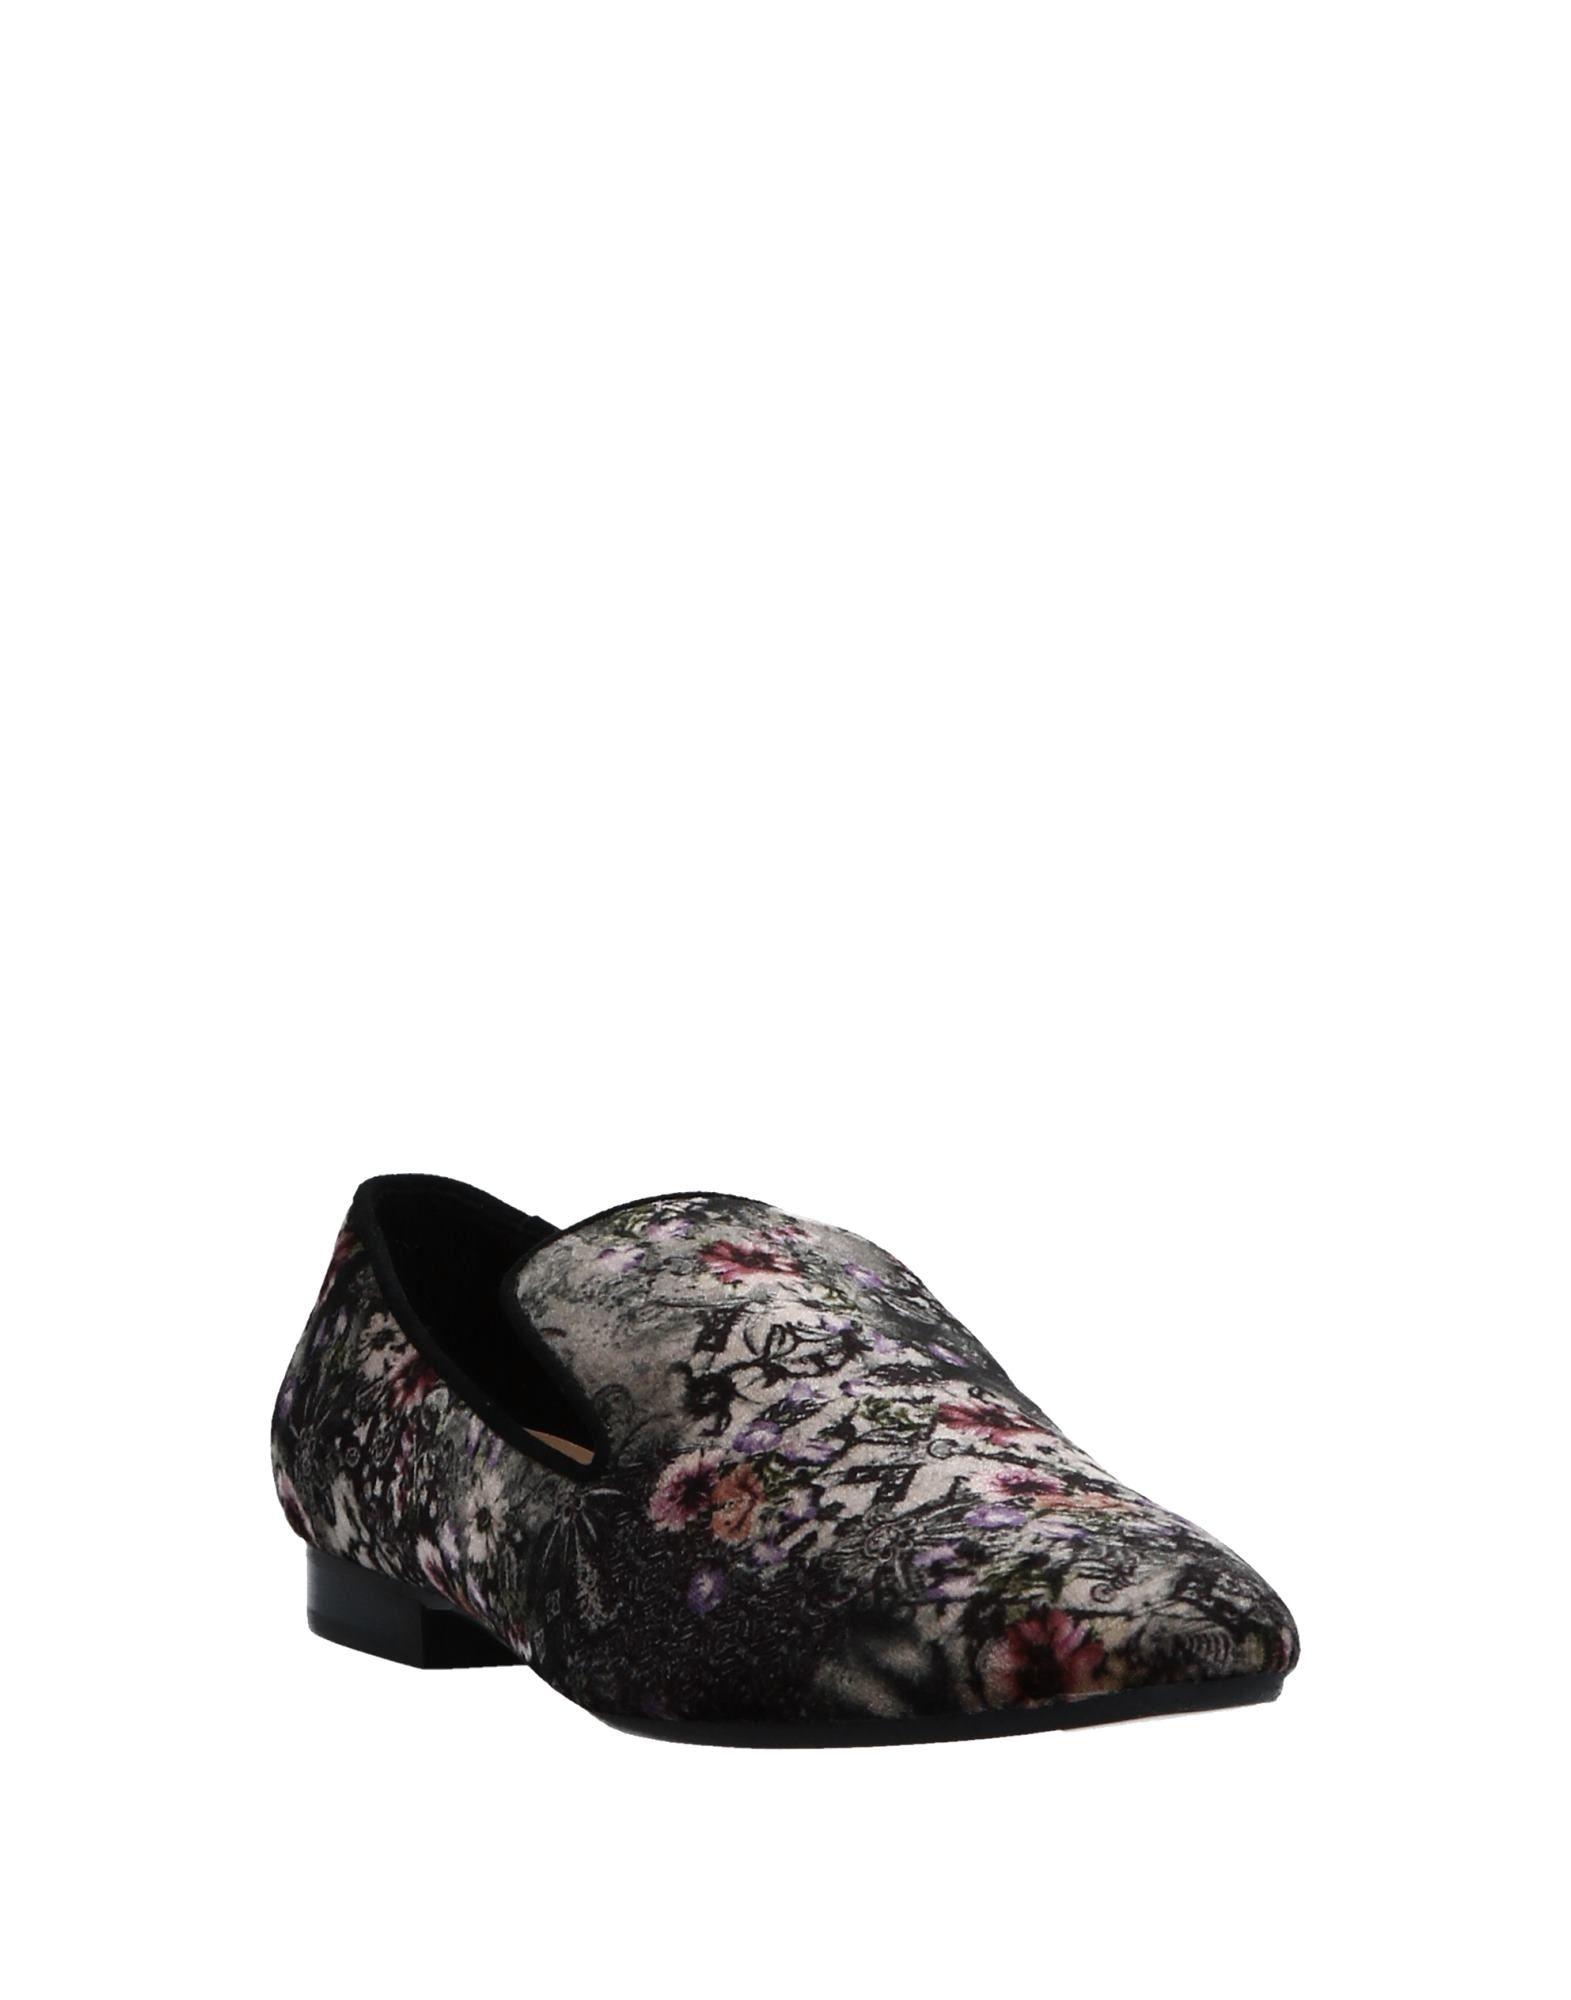 Fabio Rusconi Mokassins Damen  11532460FO Gute Qualität beliebte Schuhe